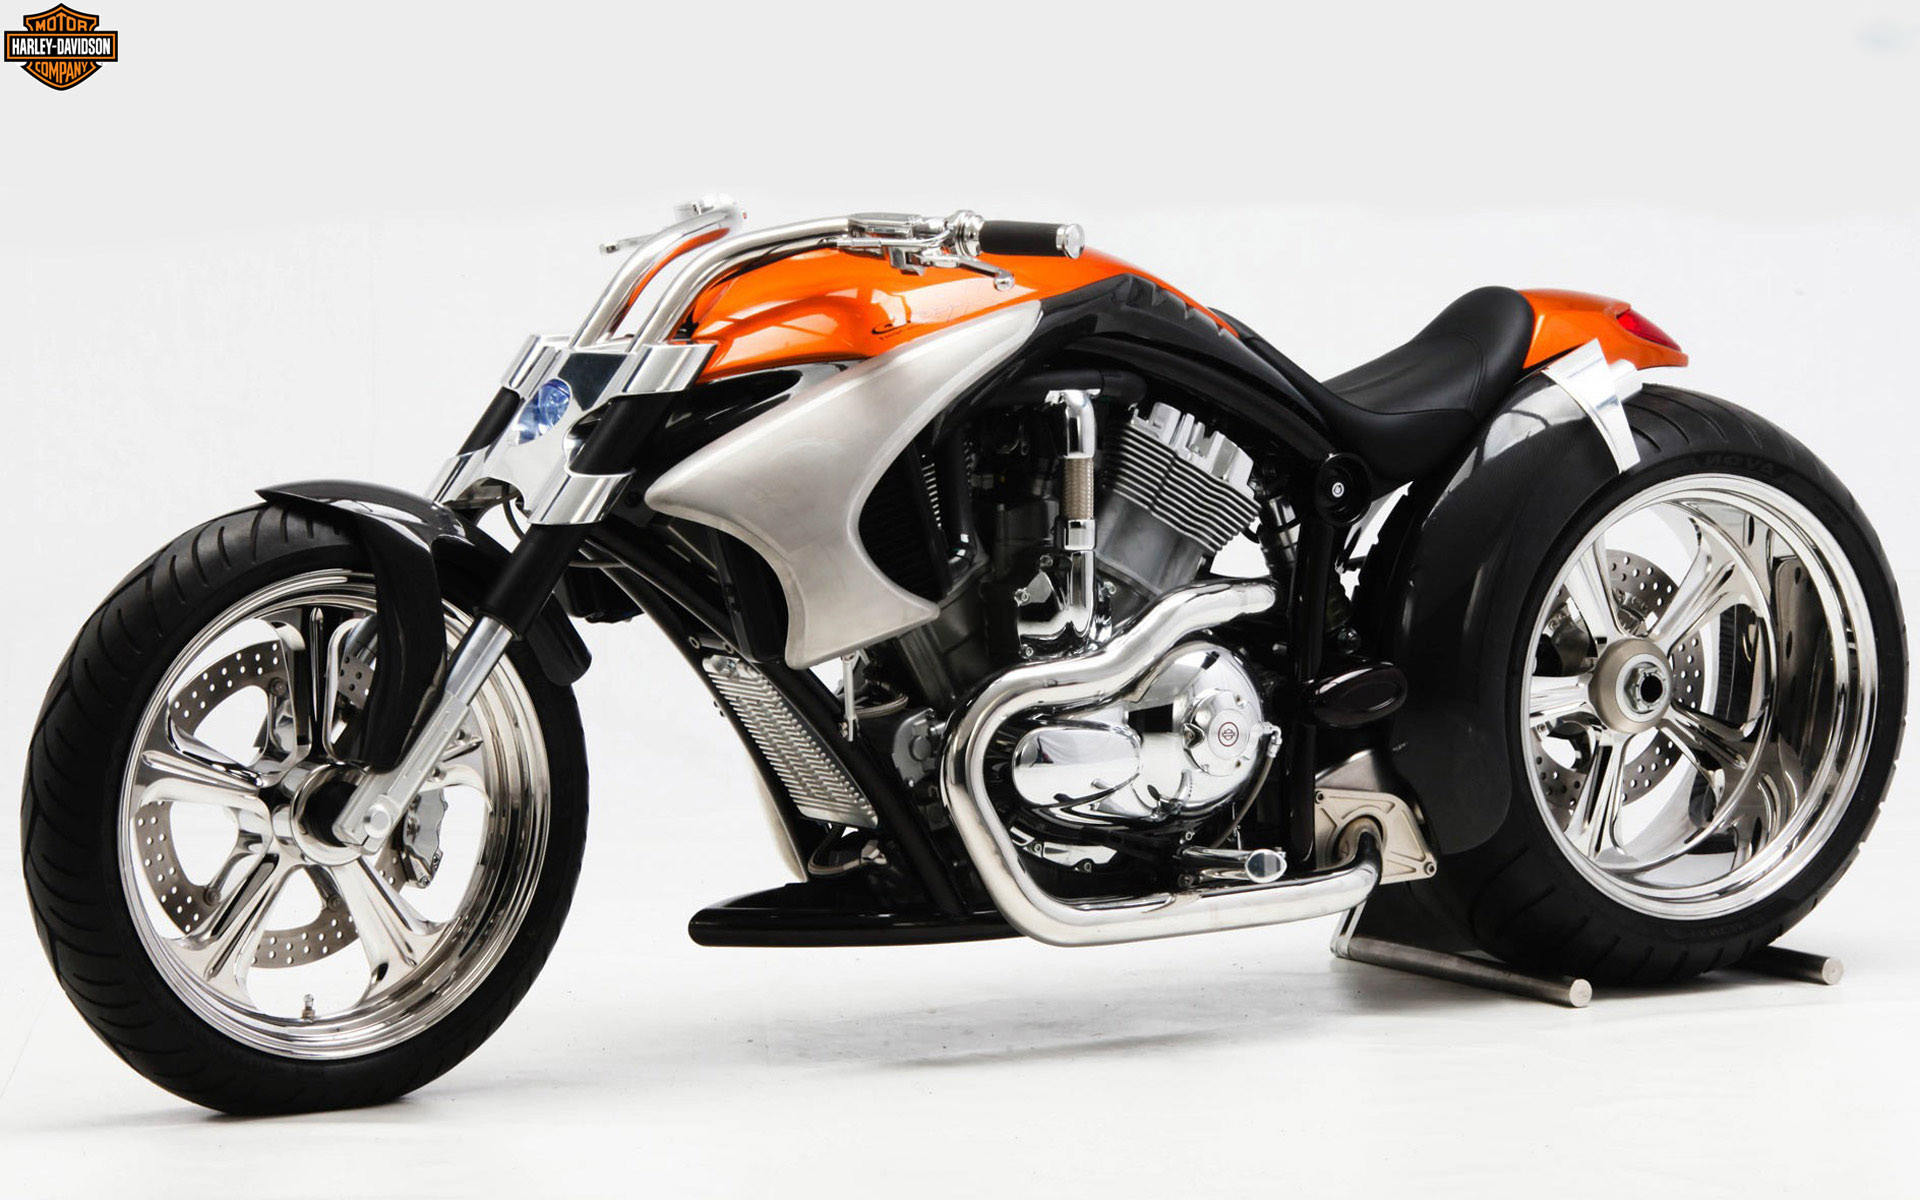 Harley Davidson Bikes Wallpapers 76 Images